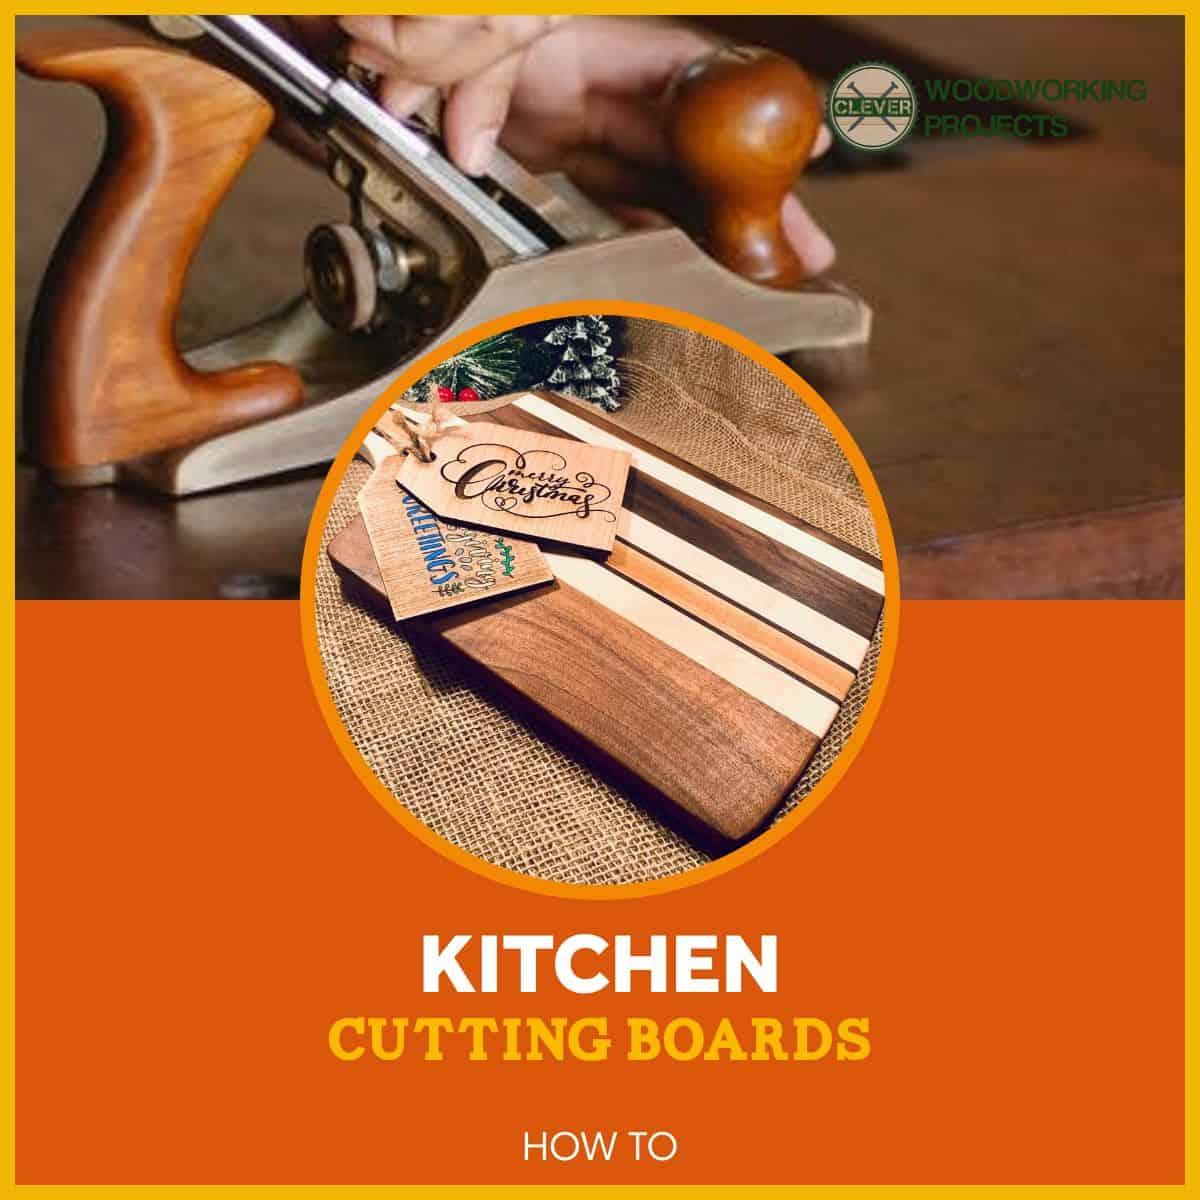 Kitchen Cutting Boards